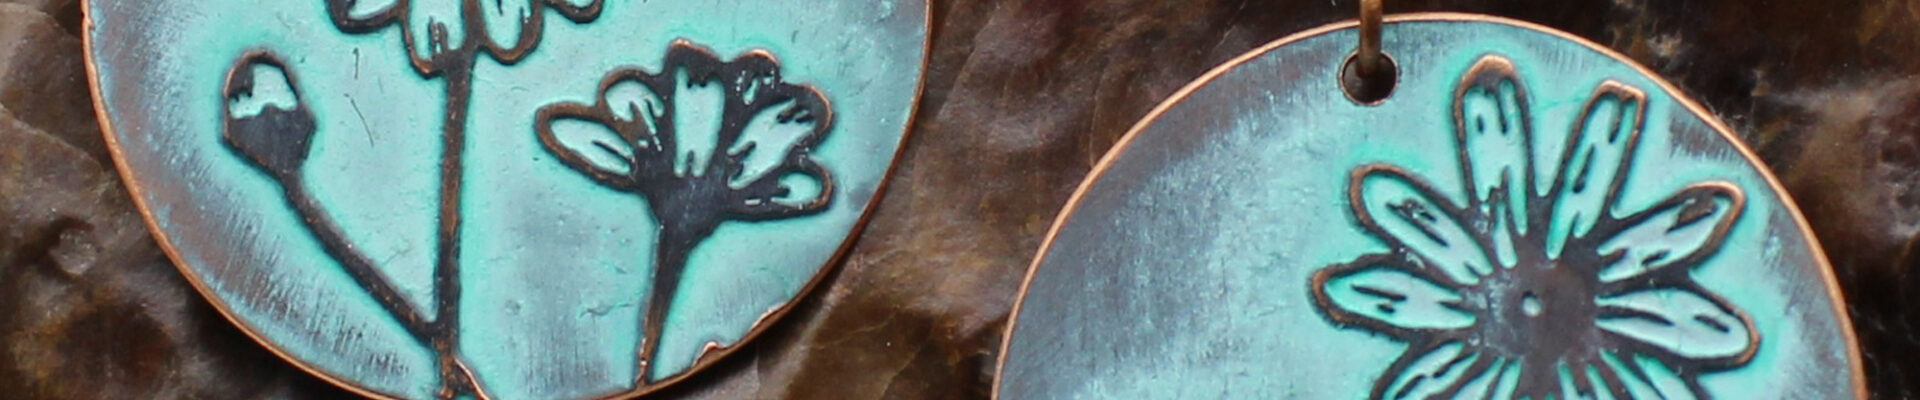 Daisy (Turquoise), Handmade Copper Earrings